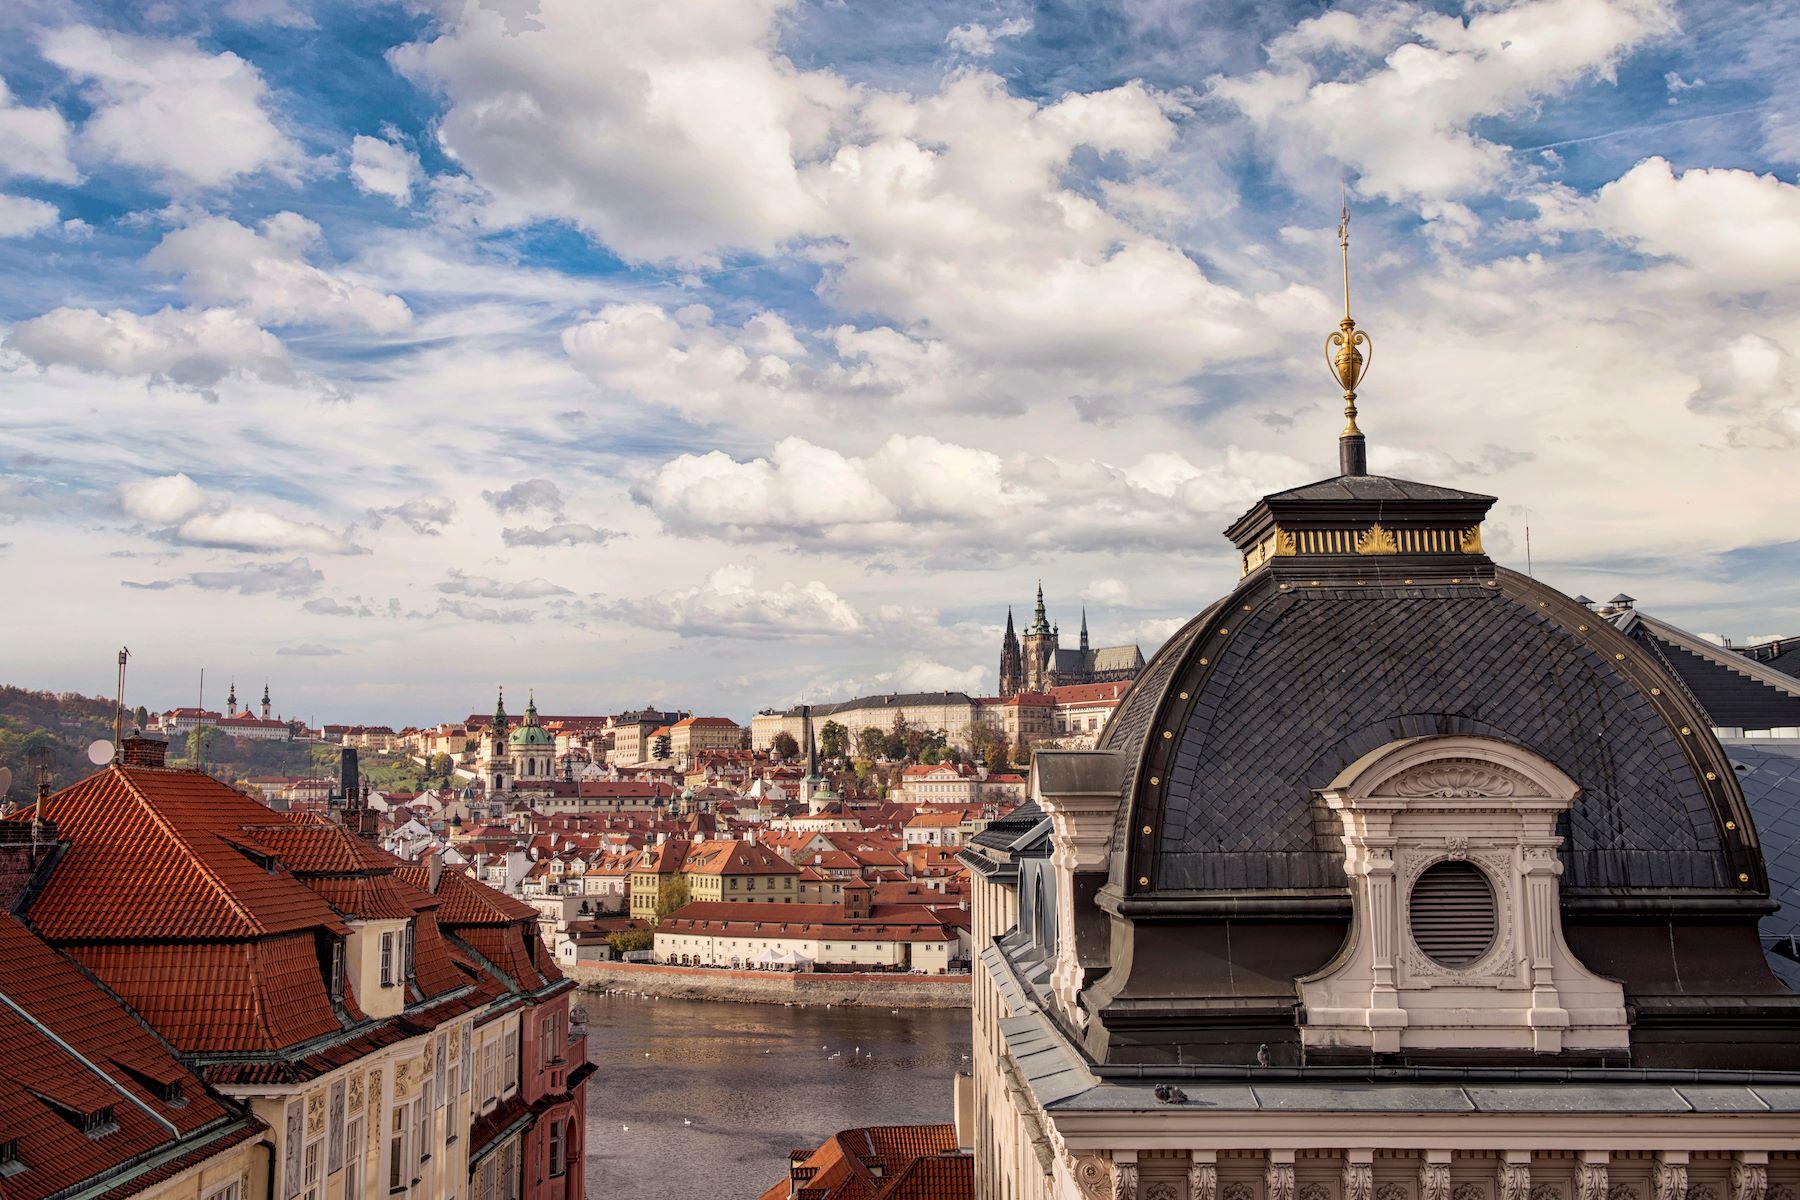 дуплекс для того Продажа на An attractive duplex with terraces and views of Prague Castle Platnerska 87/7 Prague, Прага, 11000 Чешская Республика